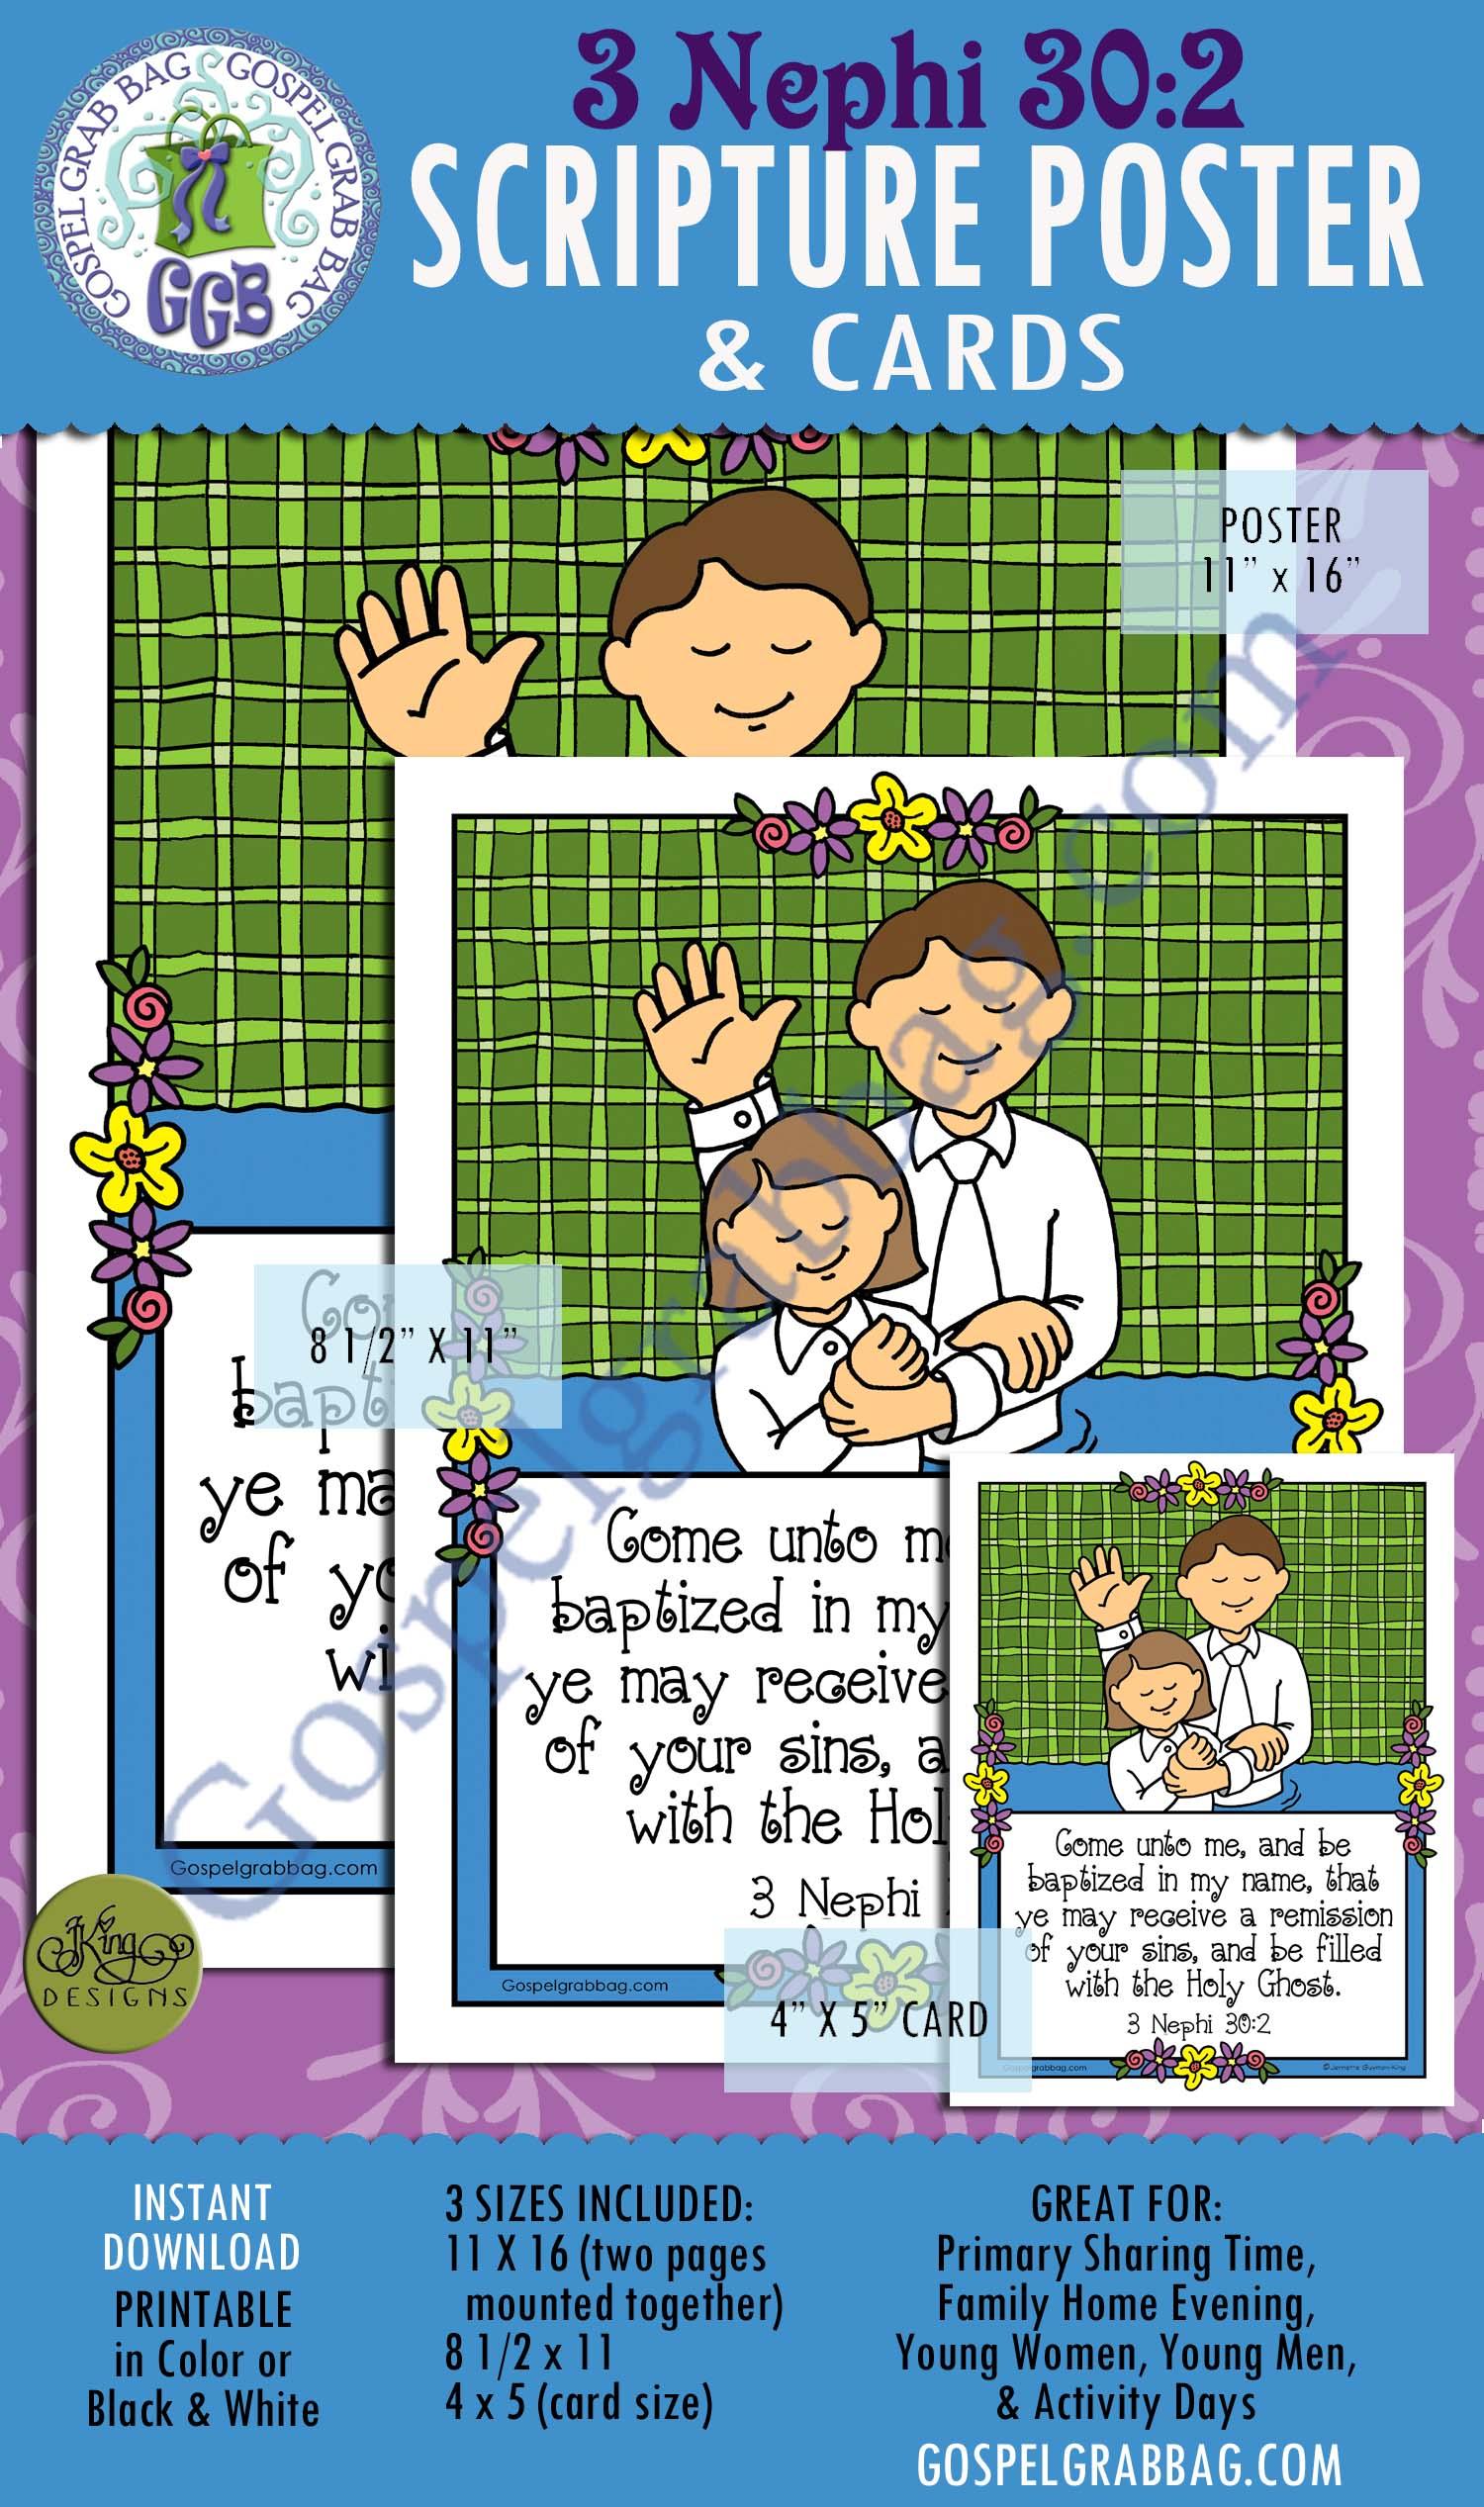 3 Nephi 30:2 SCRIPTURE POSTER & CARDS, Primary Sharing Time, Come Follow Me, Family Home Evening, Baptism, Holy Ghost, GospelGrabBag.com